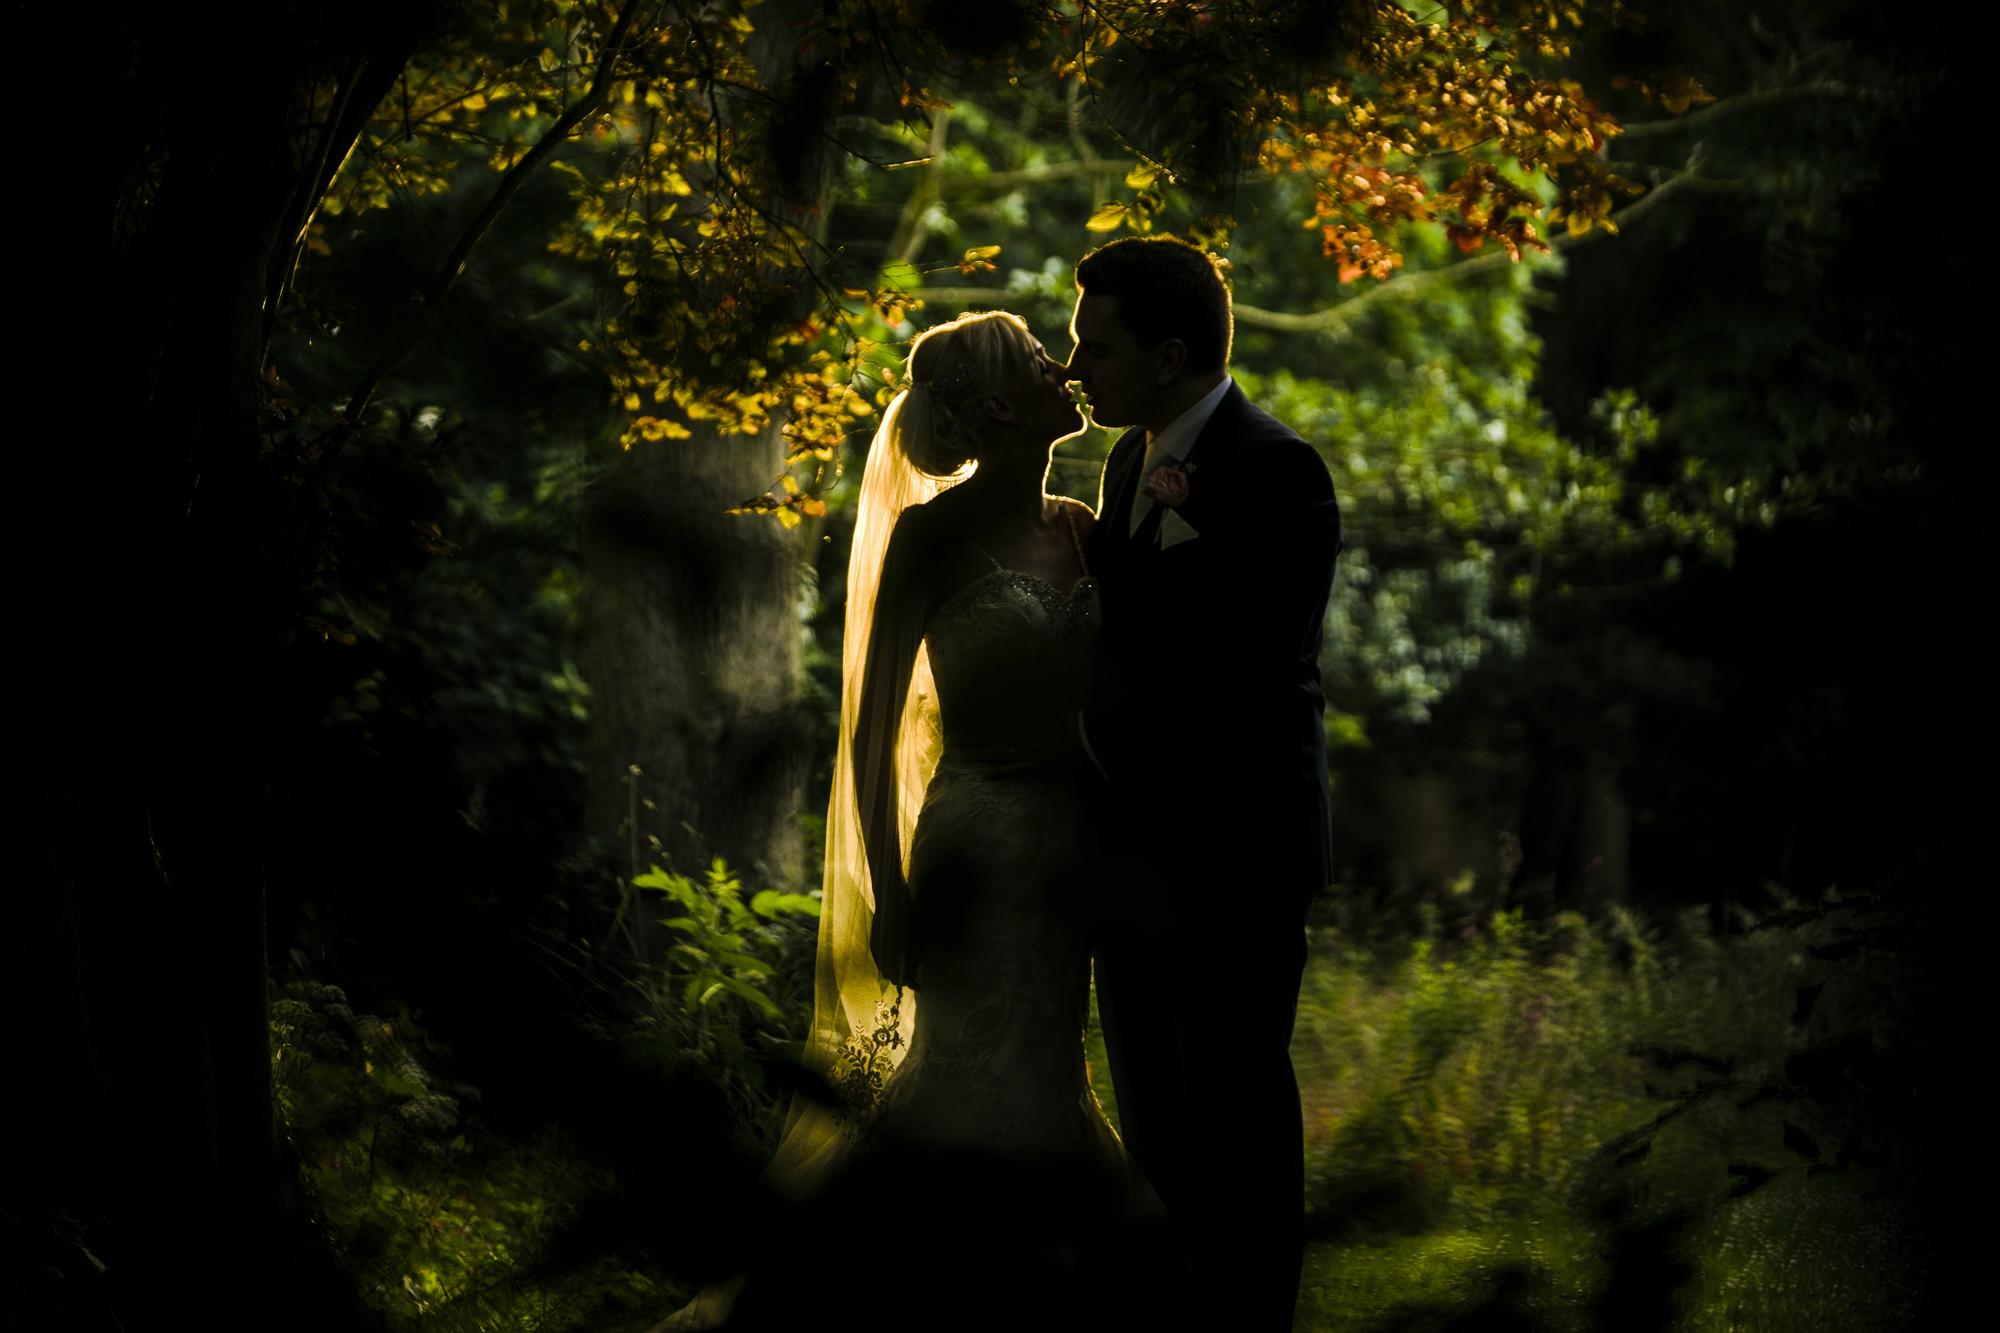 Headlam hall wedding photographer-45.jpg